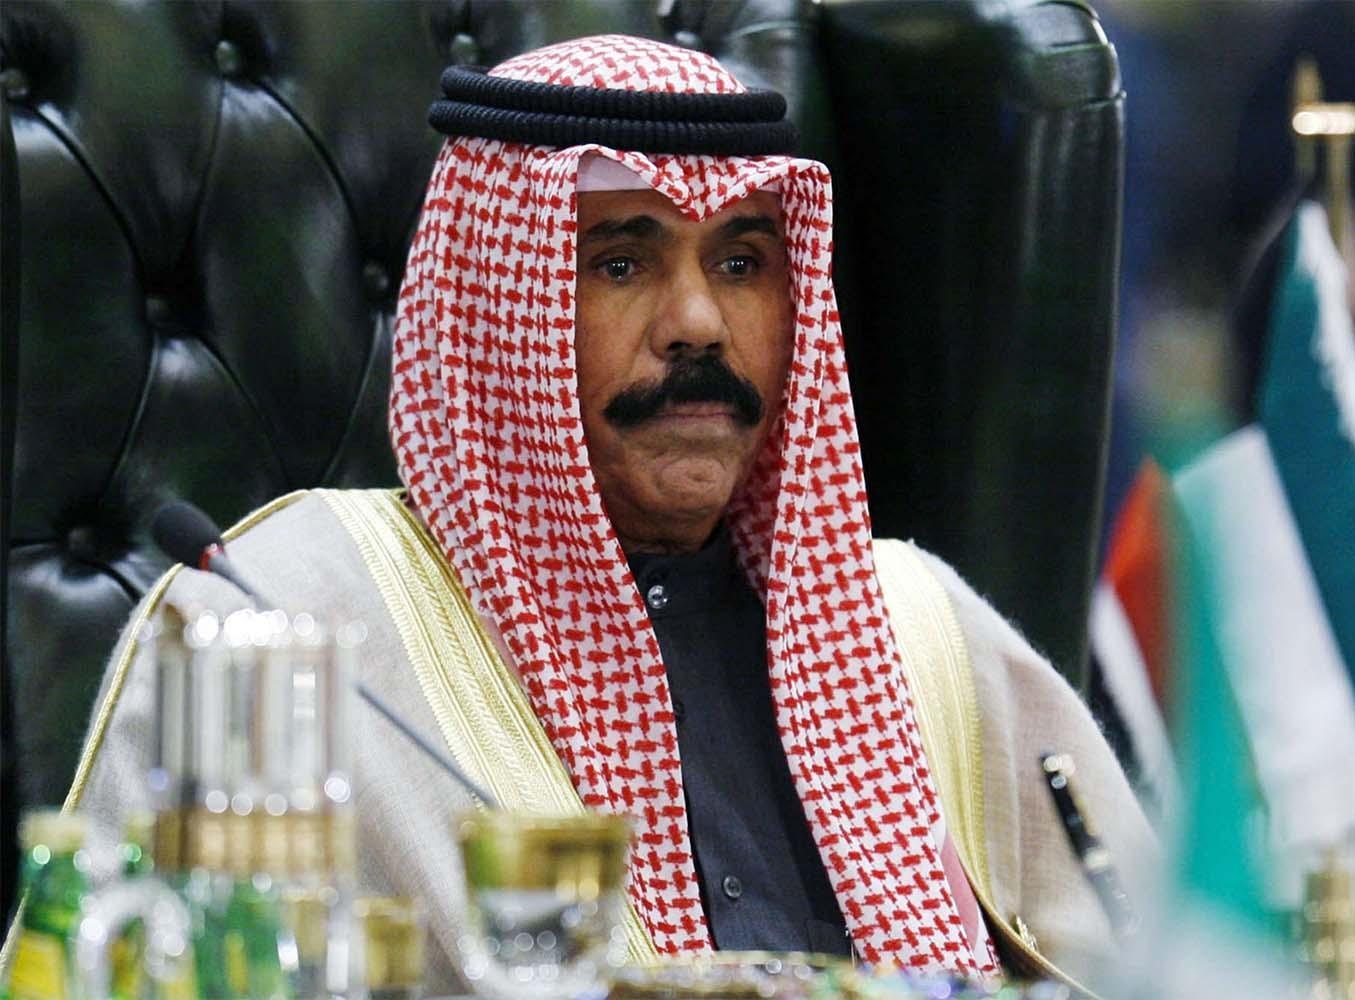 Kuwaiti emir Sheikh Sabah dies at 91, new ruler named